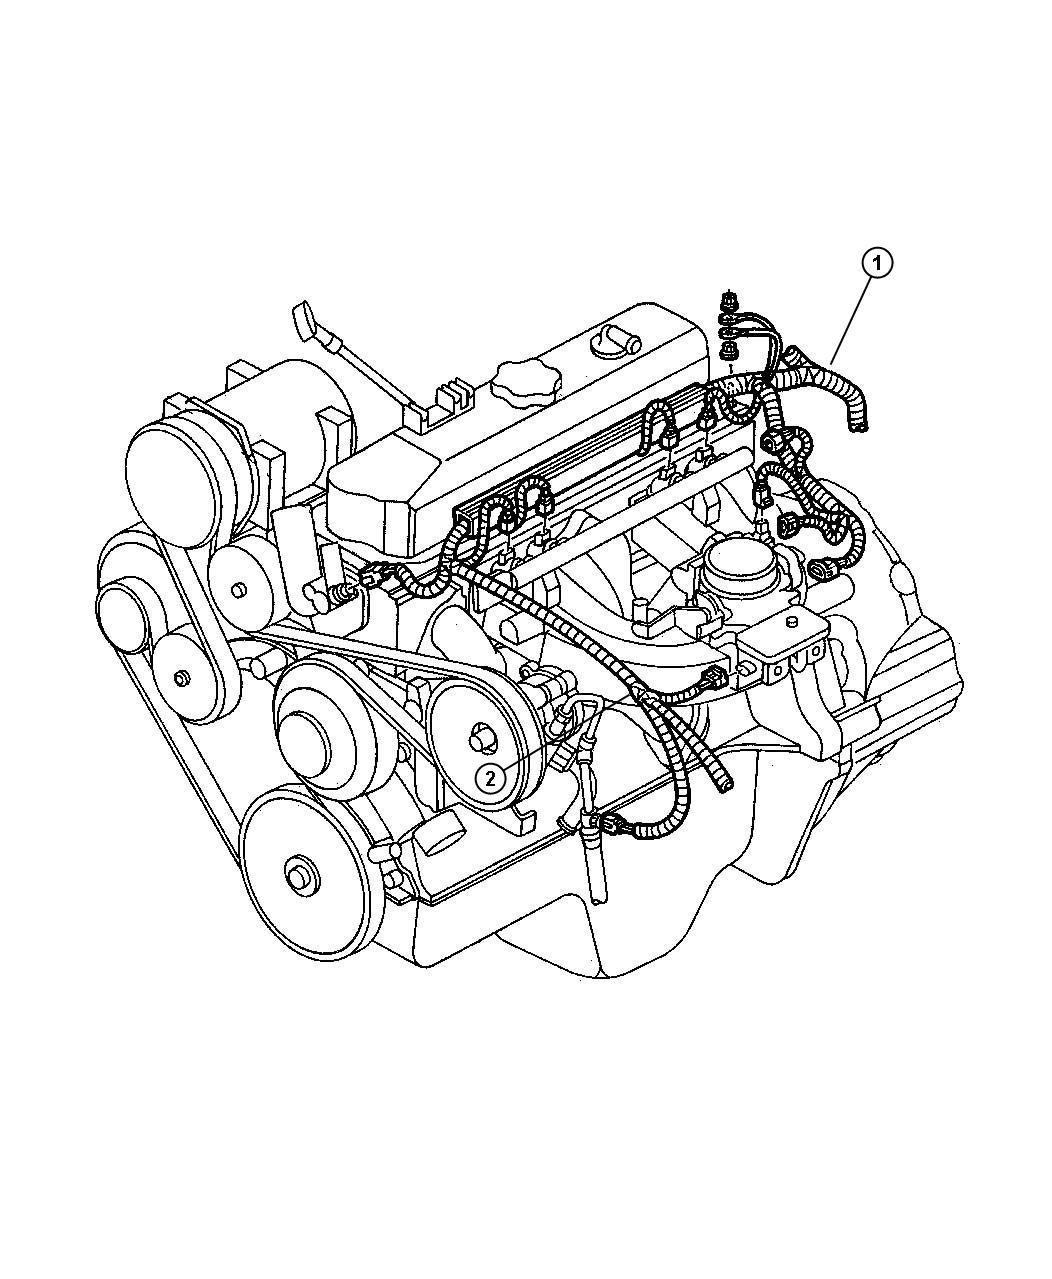 Dodge Dakota Wiring  Engine  Califonia Includes Negative